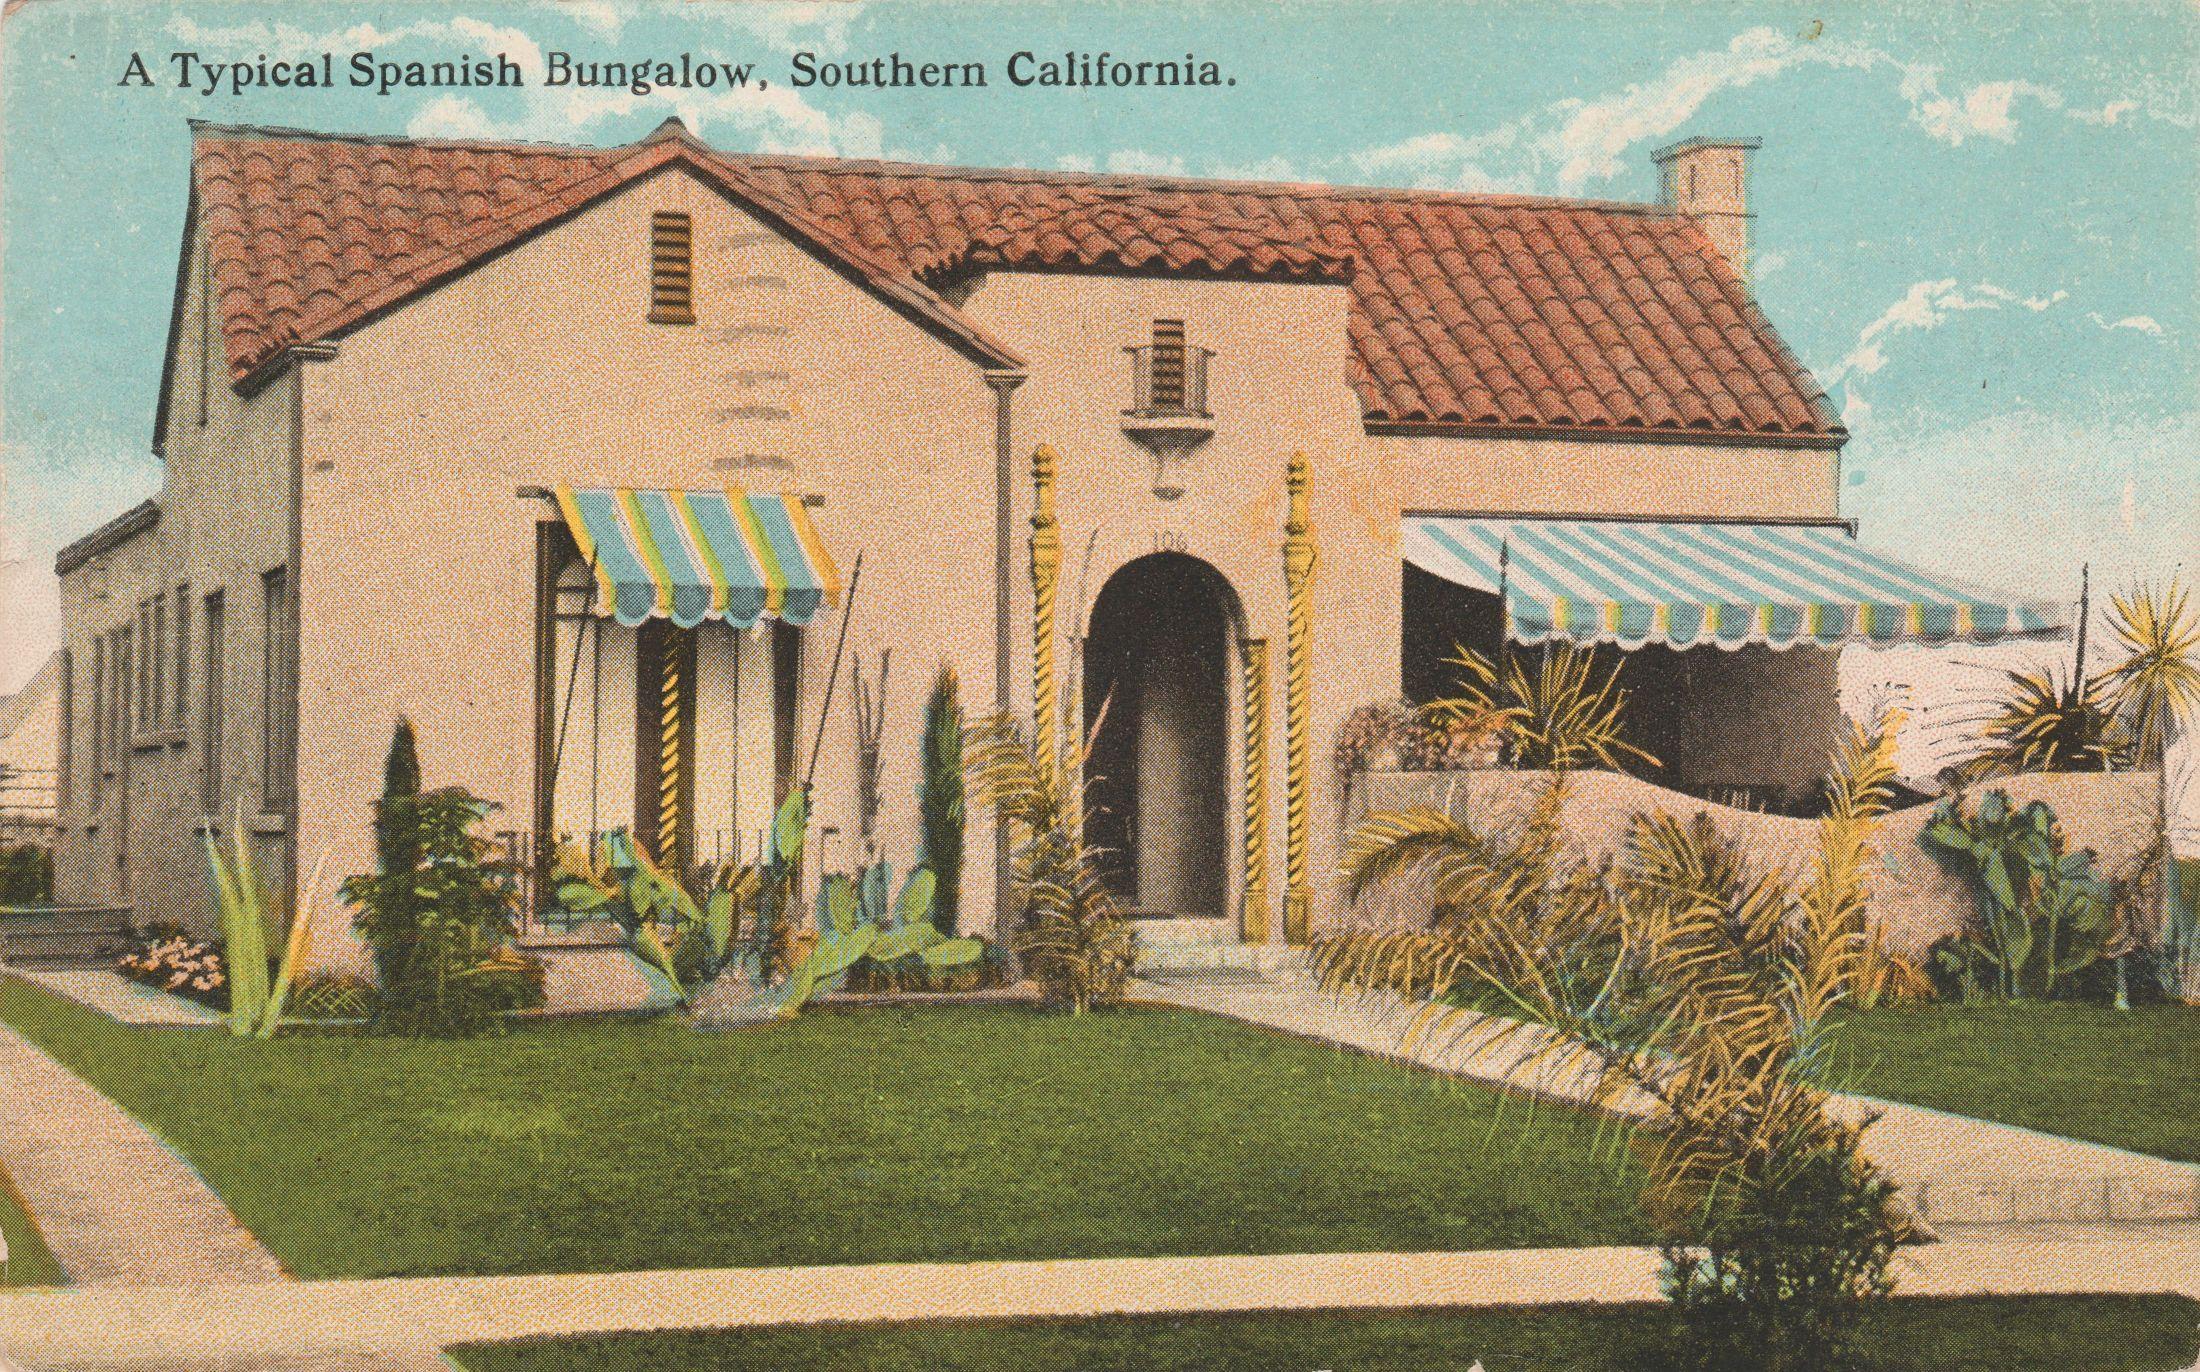 Spanish Bungalow Postcard 2200x1372 BungalowSpanish Style HousesSpanish